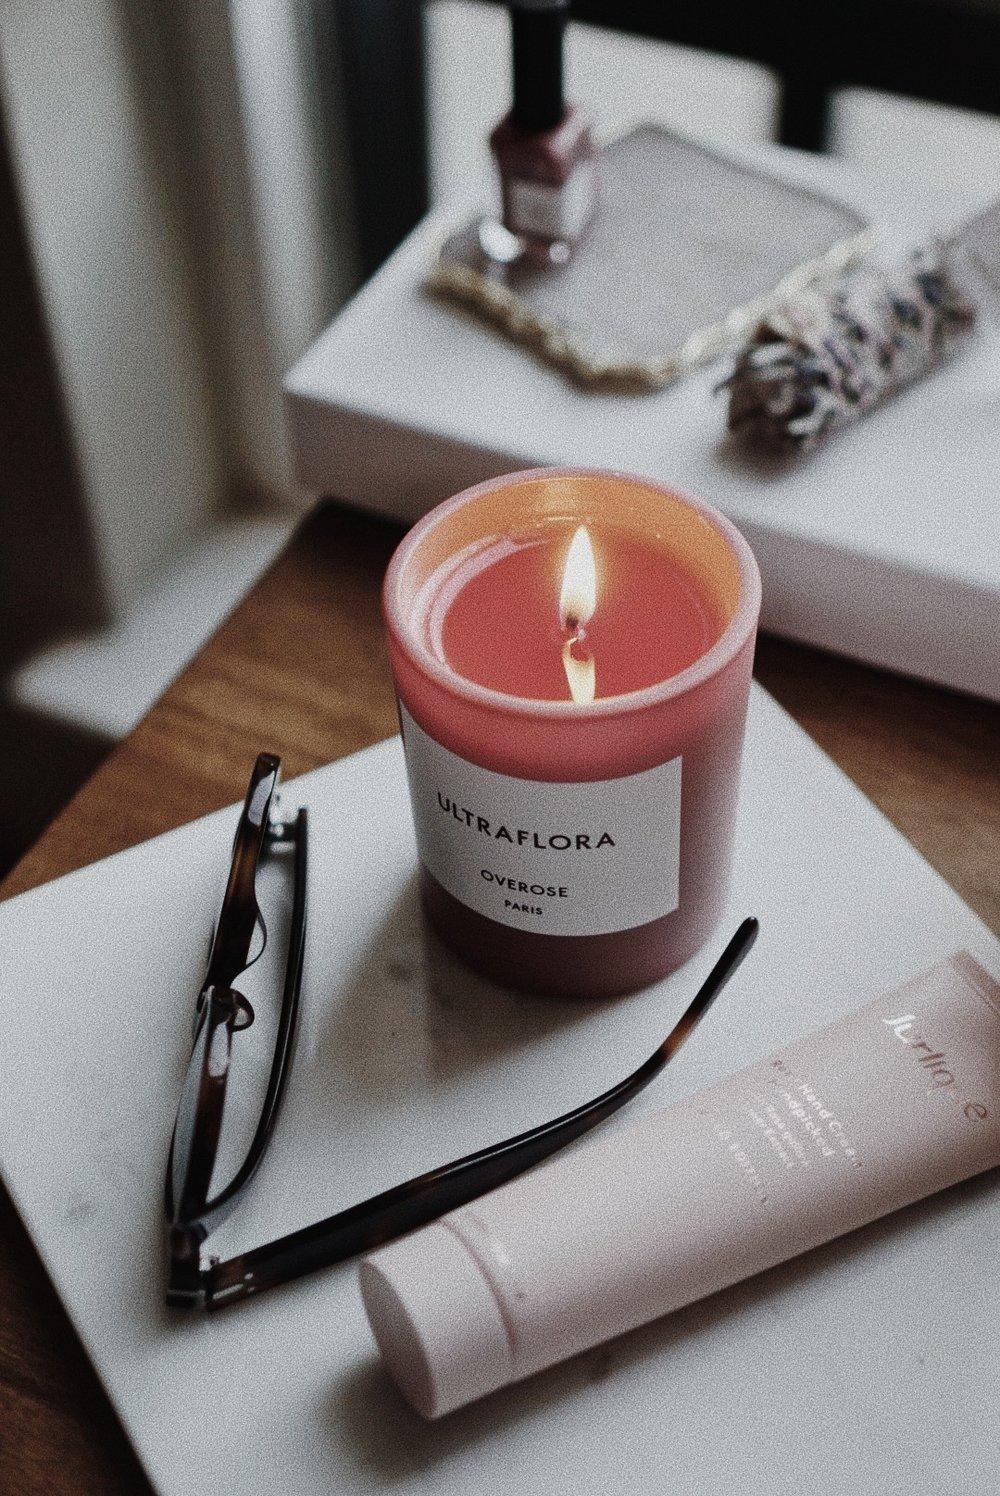 Overose Ultraflora Candle Jasmine; Jurlique Handpicked Rose Cream Limited Edition